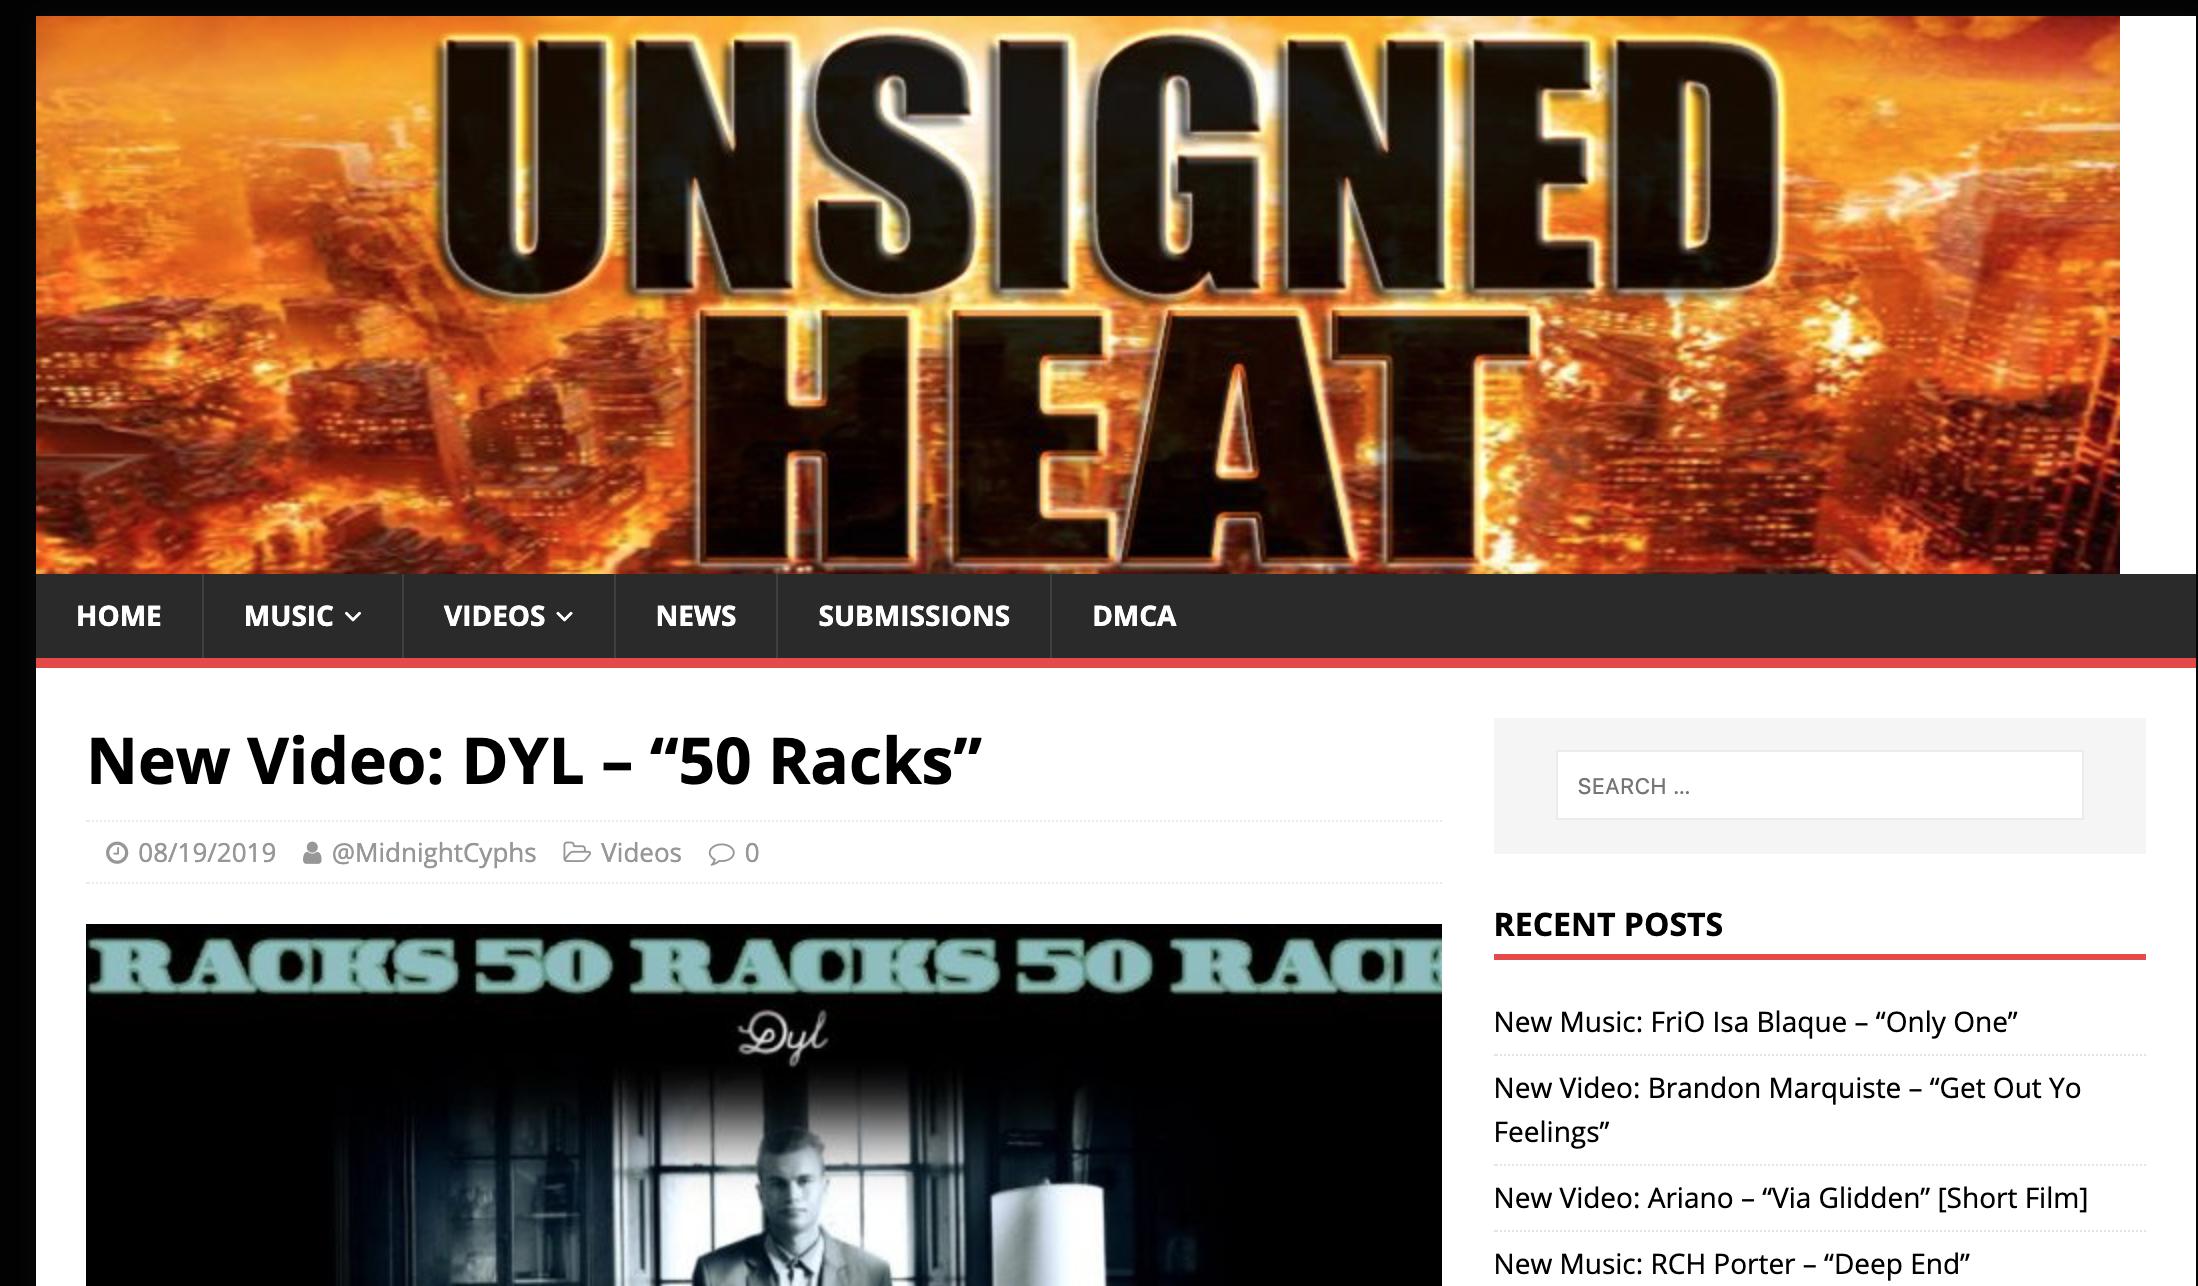 Dyl - 50 Racks Unsigned Heat